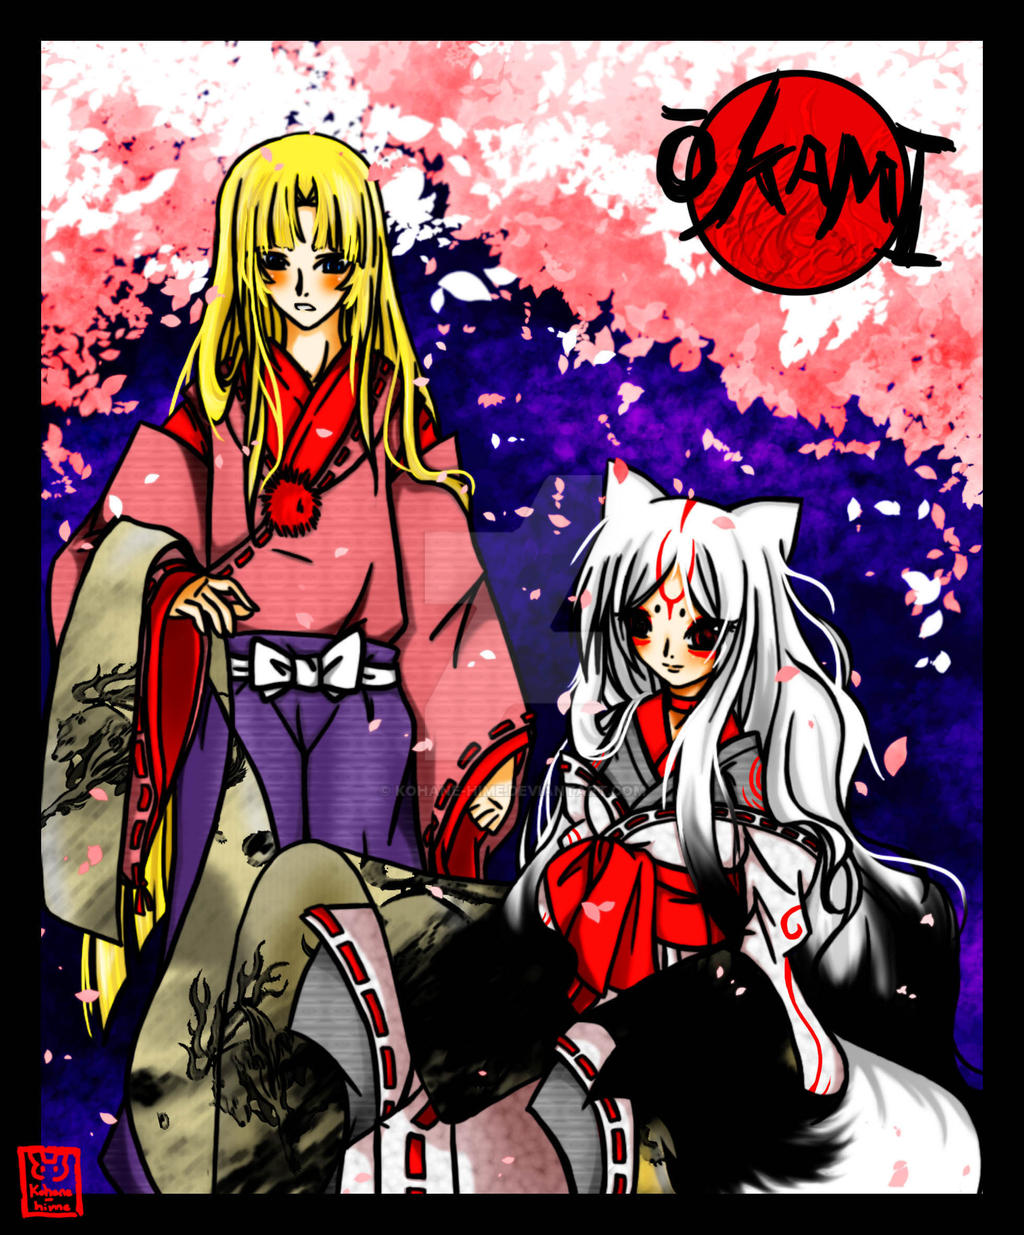 Okami Amaterasu by Kohane-hime on DeviantArt